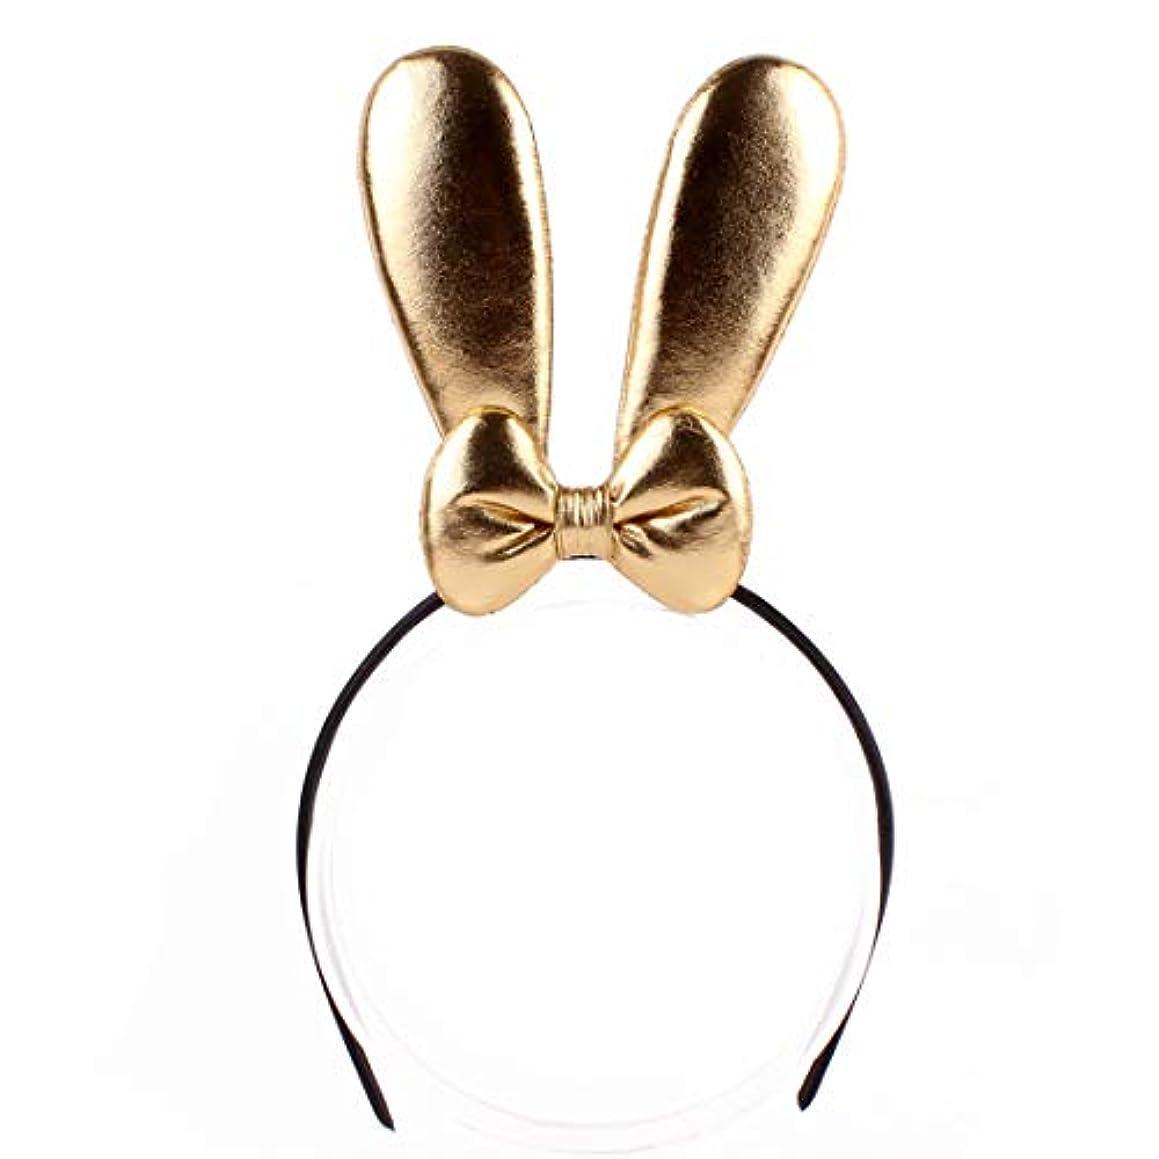 Easter Headband Bunny Ear HairBand Easter Gift (FHJ2)